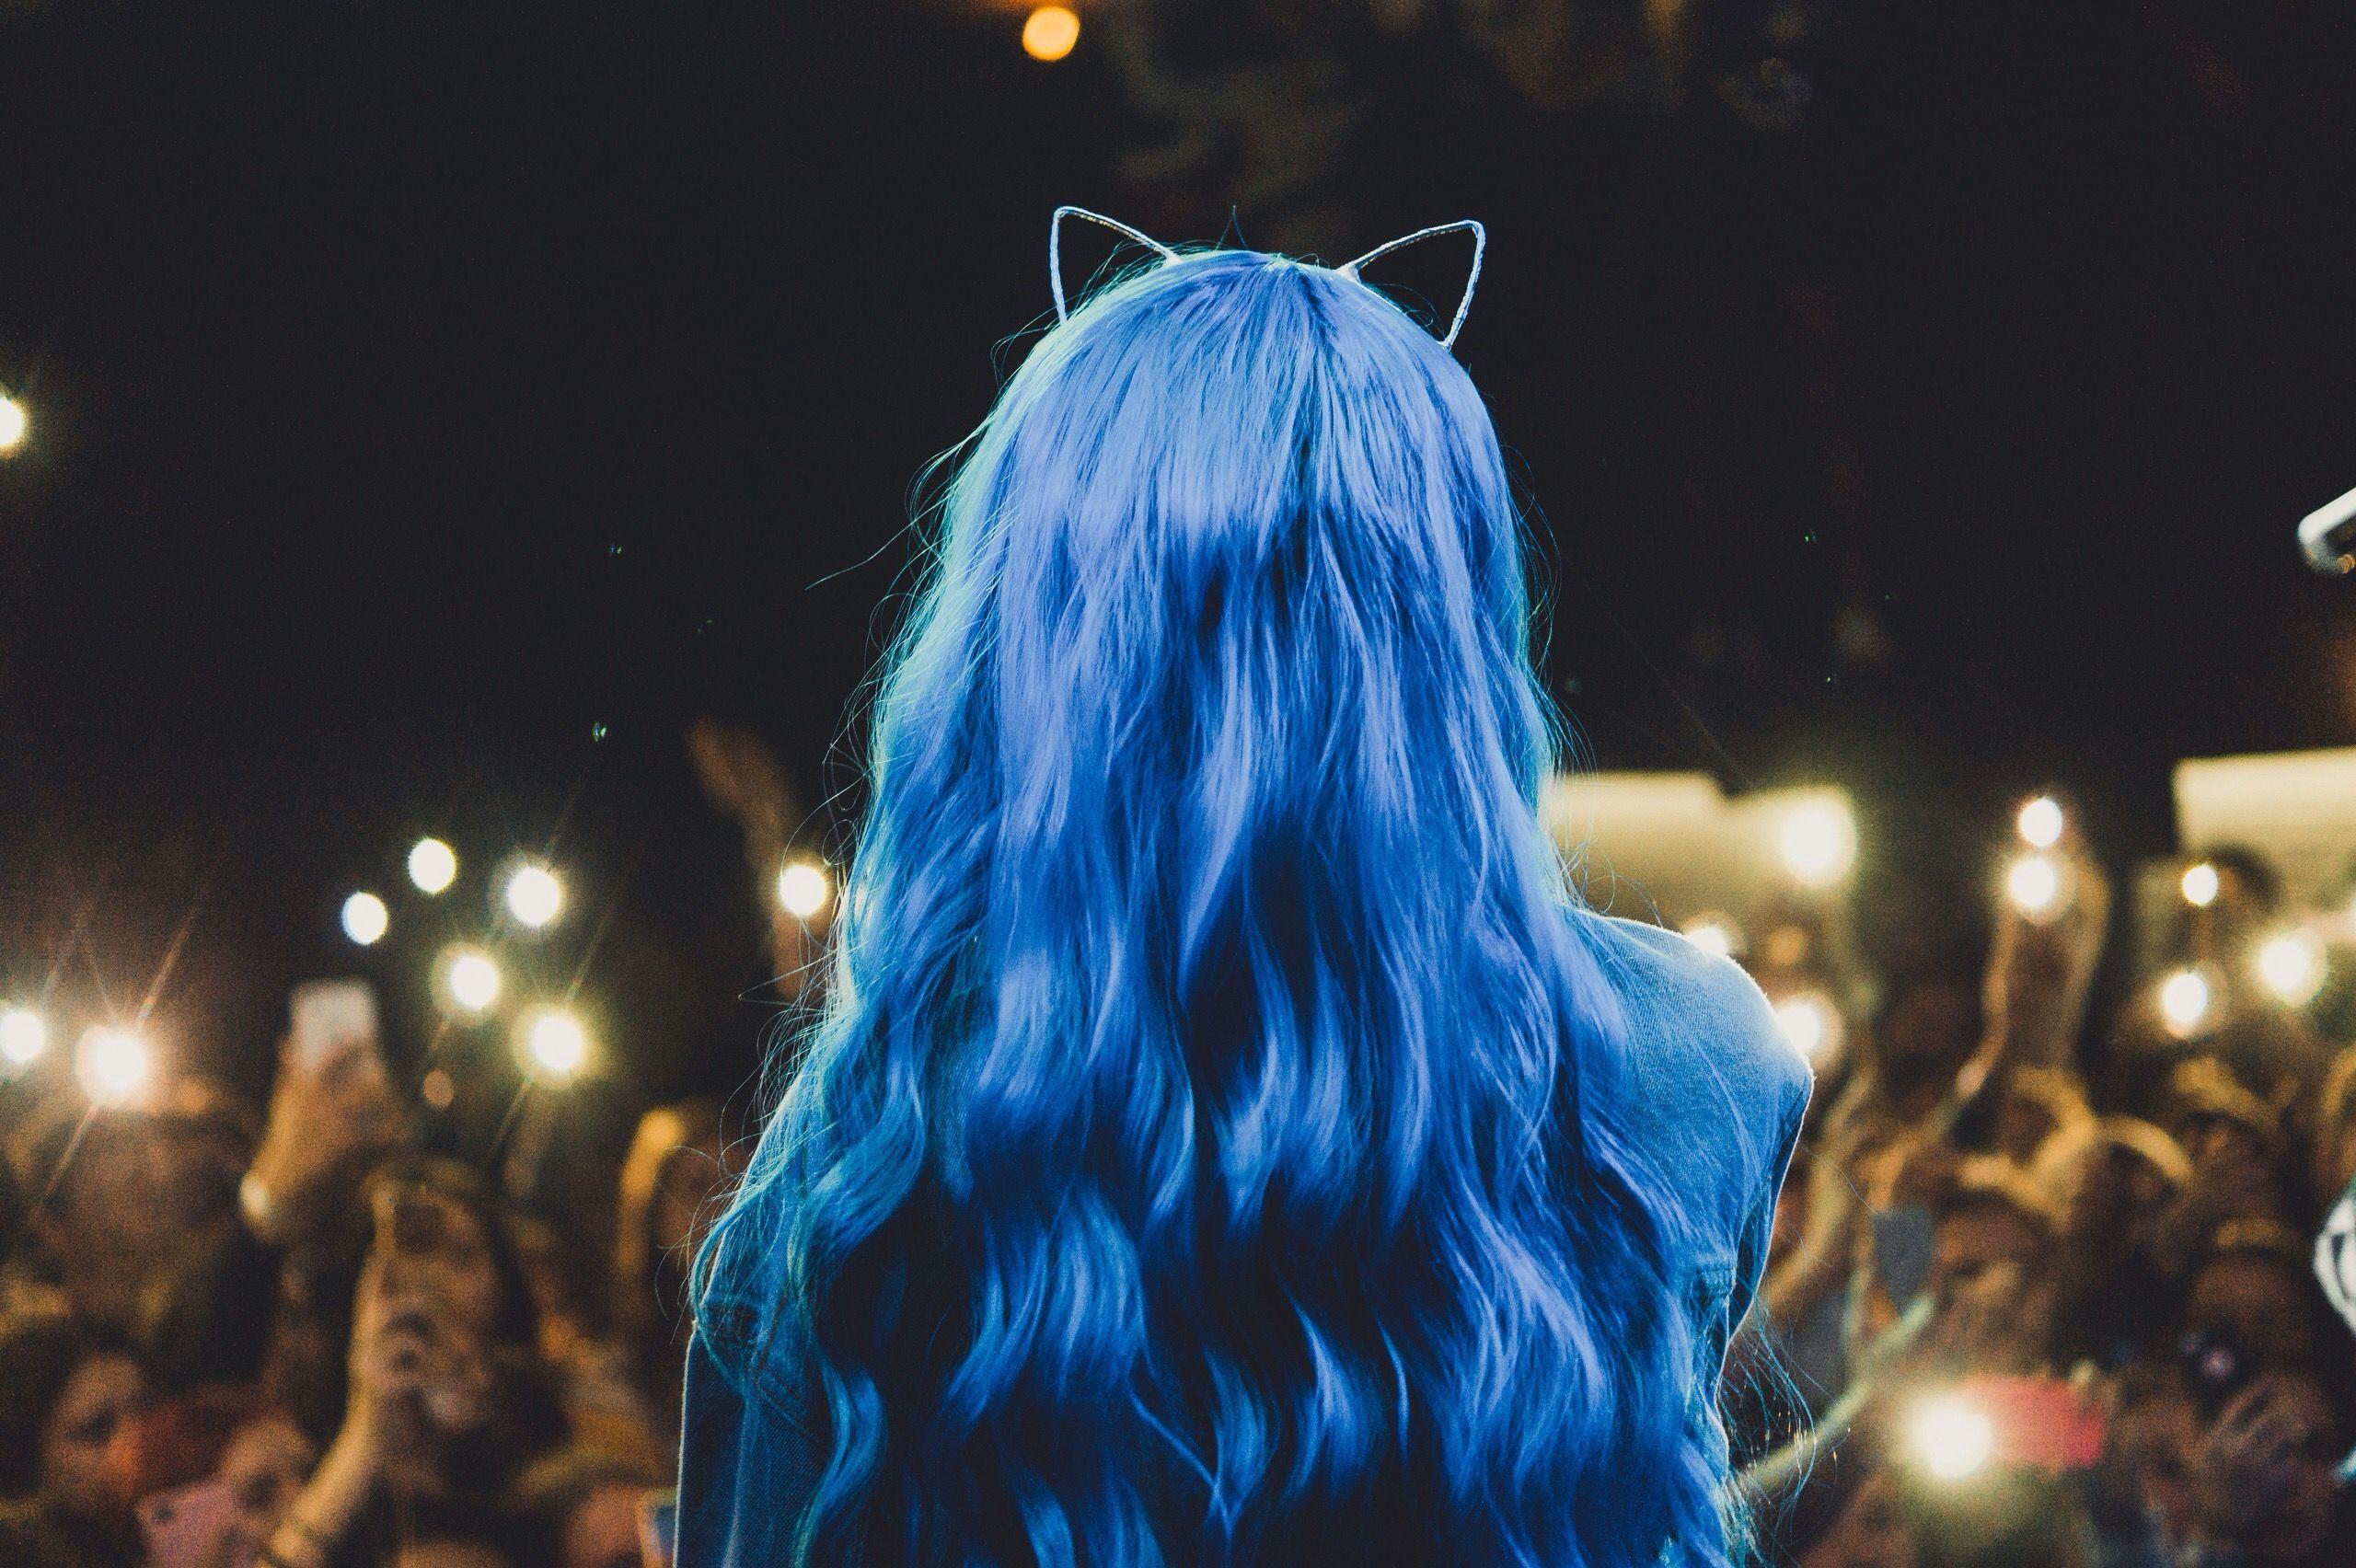 Картинки девушки с синими волосами